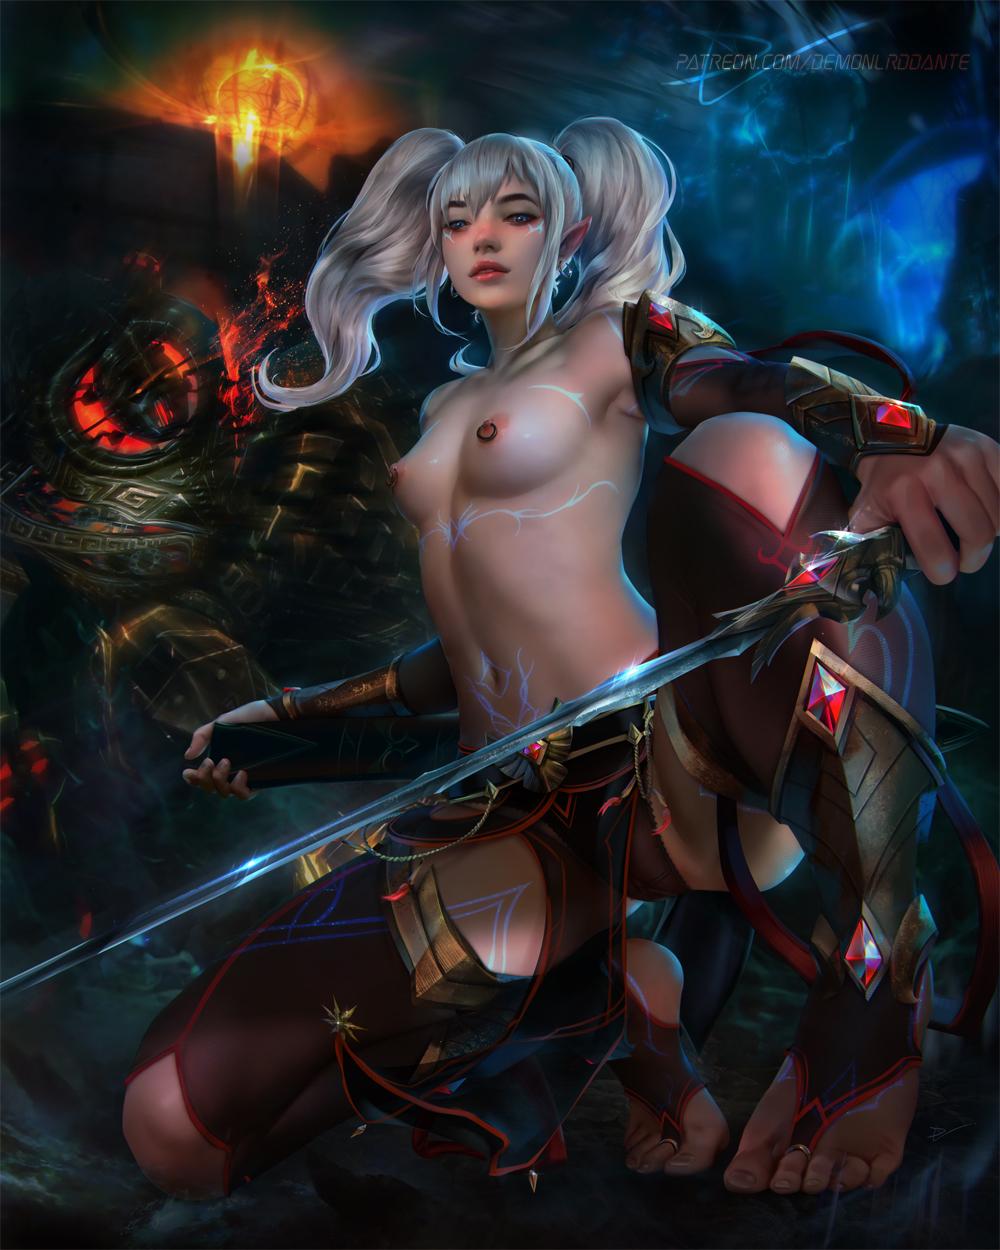 Elder Scrolls elf girl